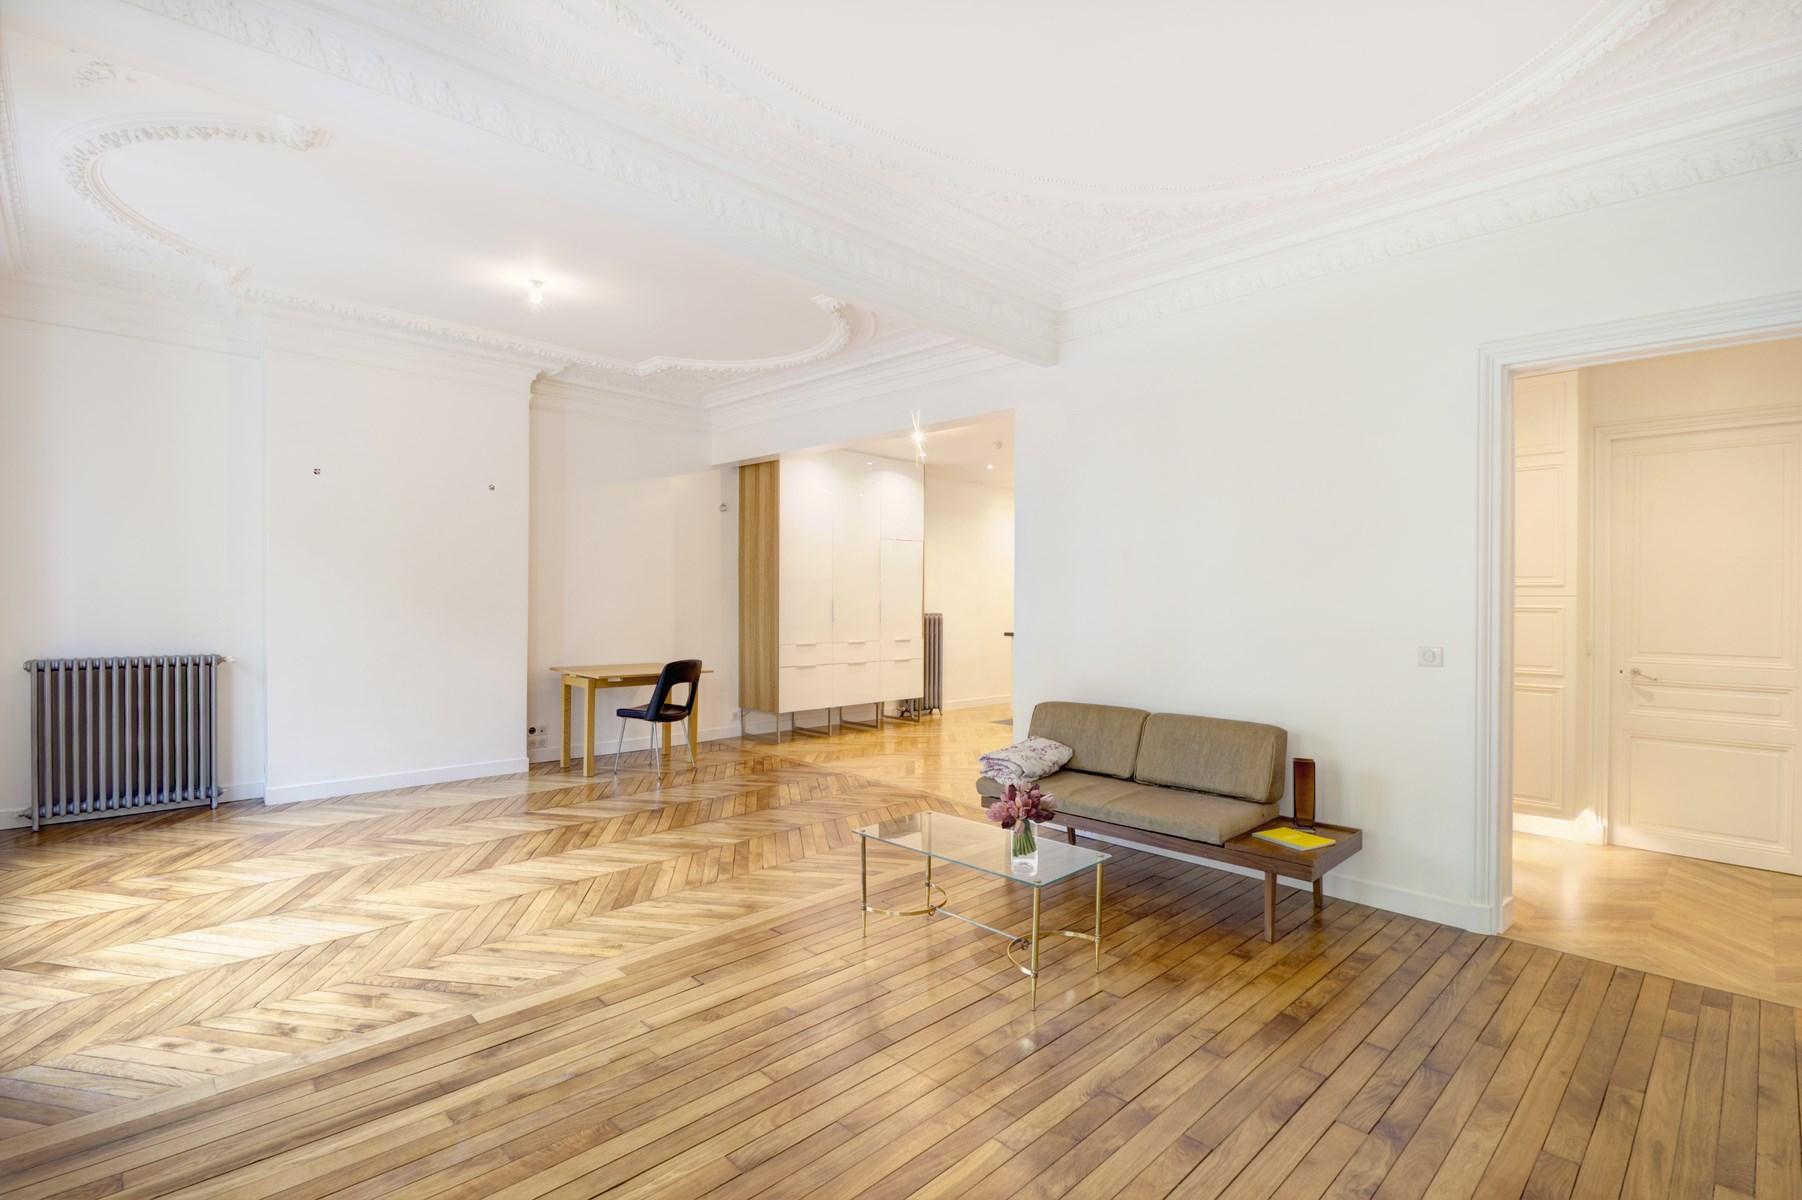 Rnovation Dun Appartement Haussmannien Paris Mairie 19eme